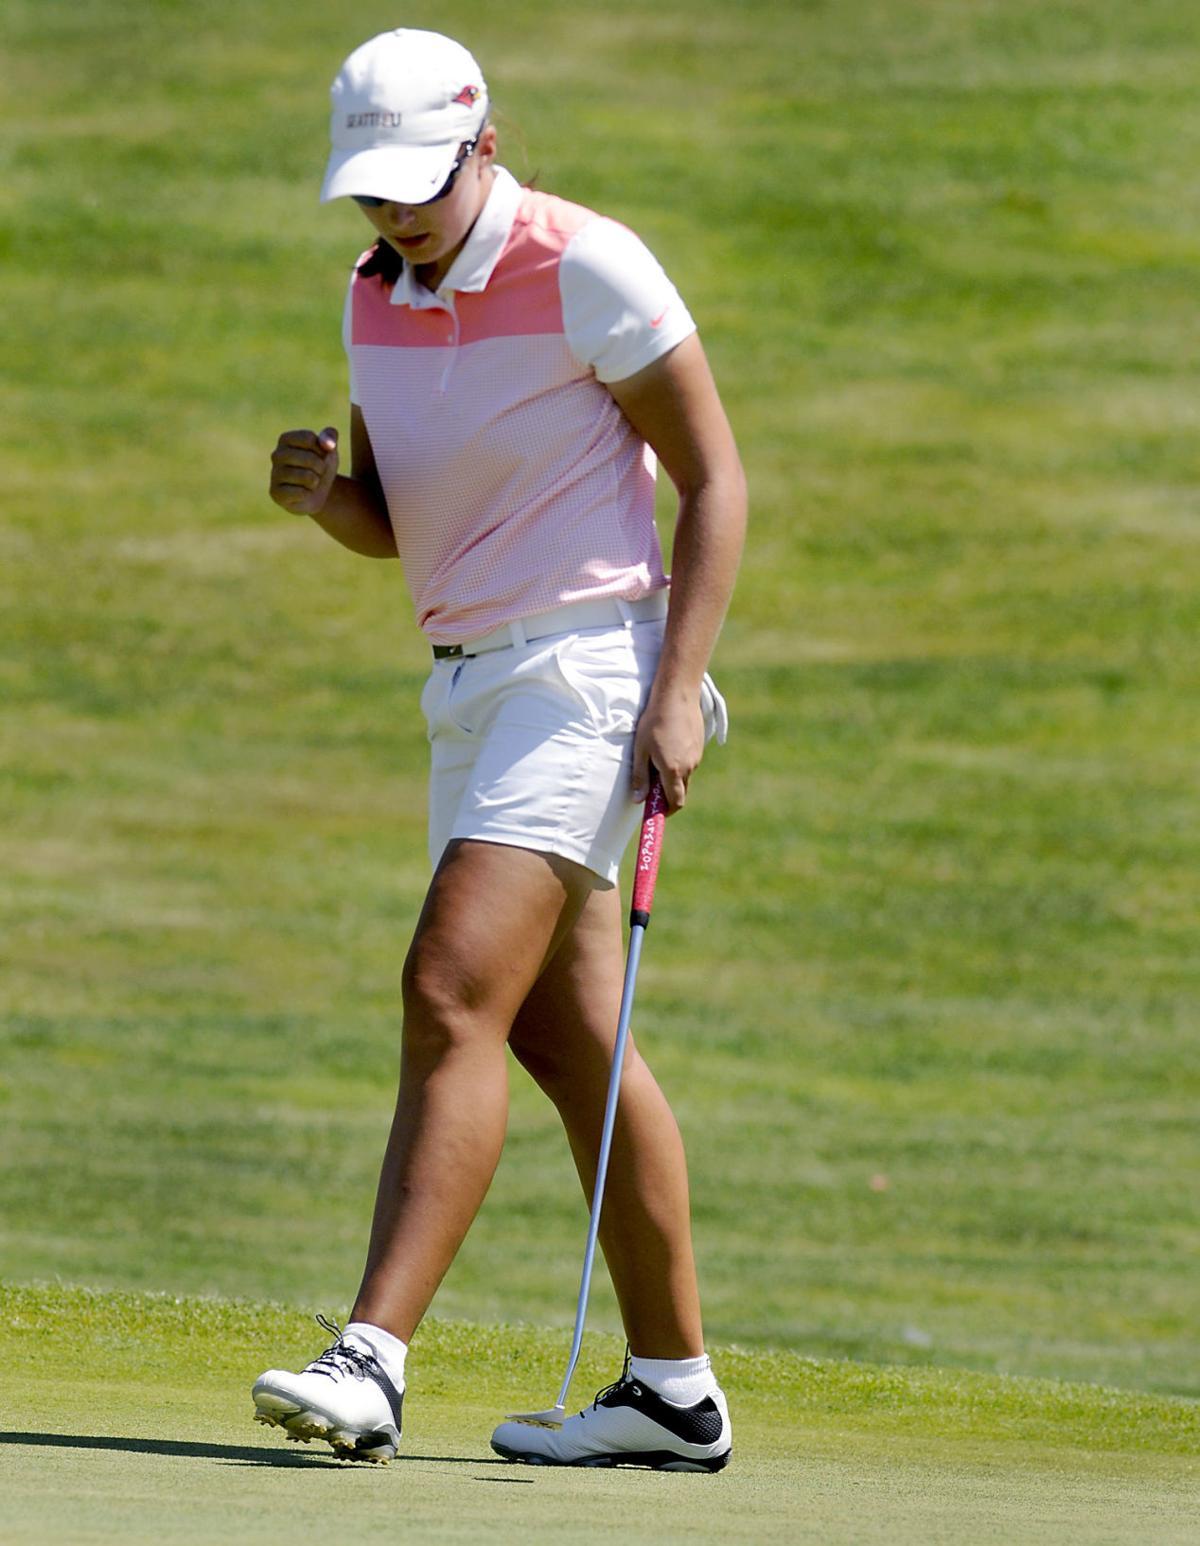 072215 women's golf2 kw.jpg